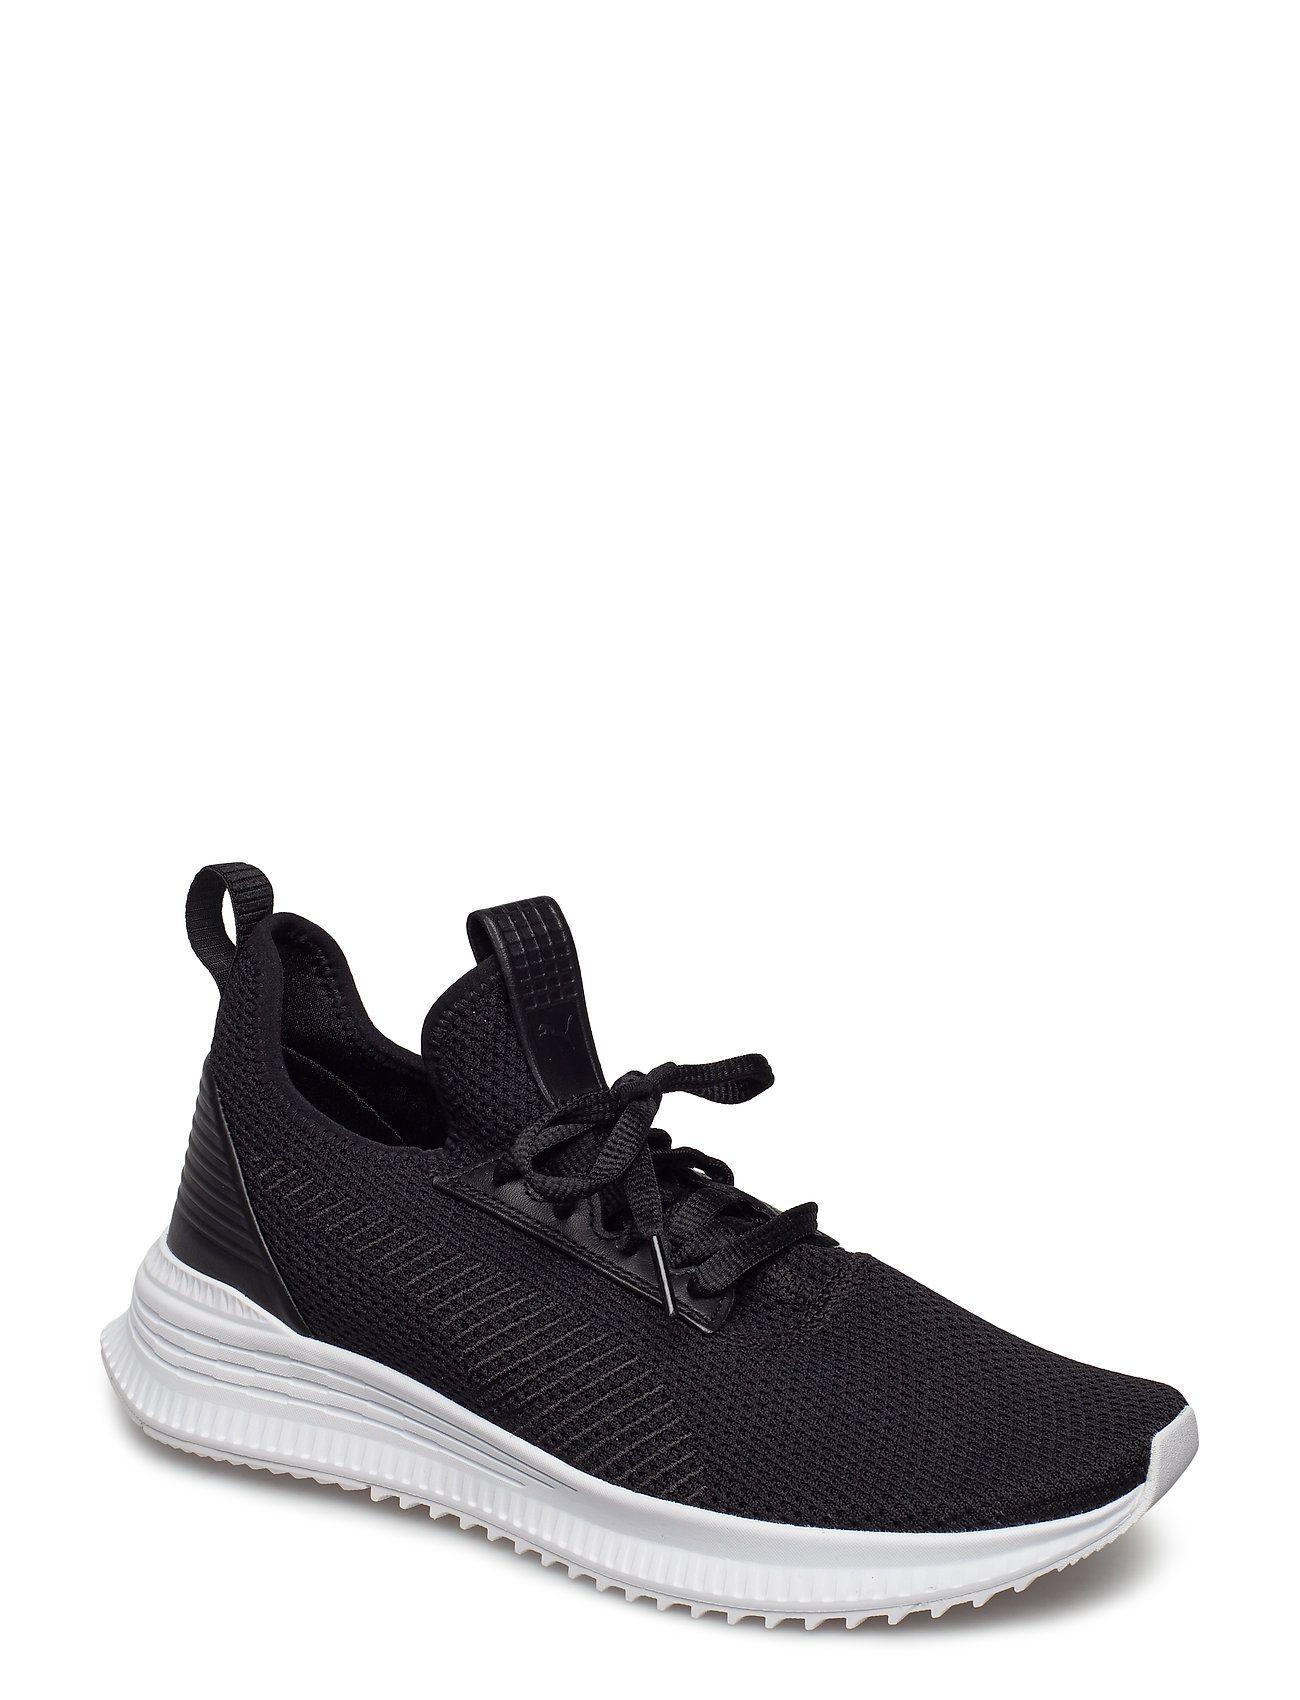 PUMA AVID FoF   Shoes, Adidas tubular, Puma